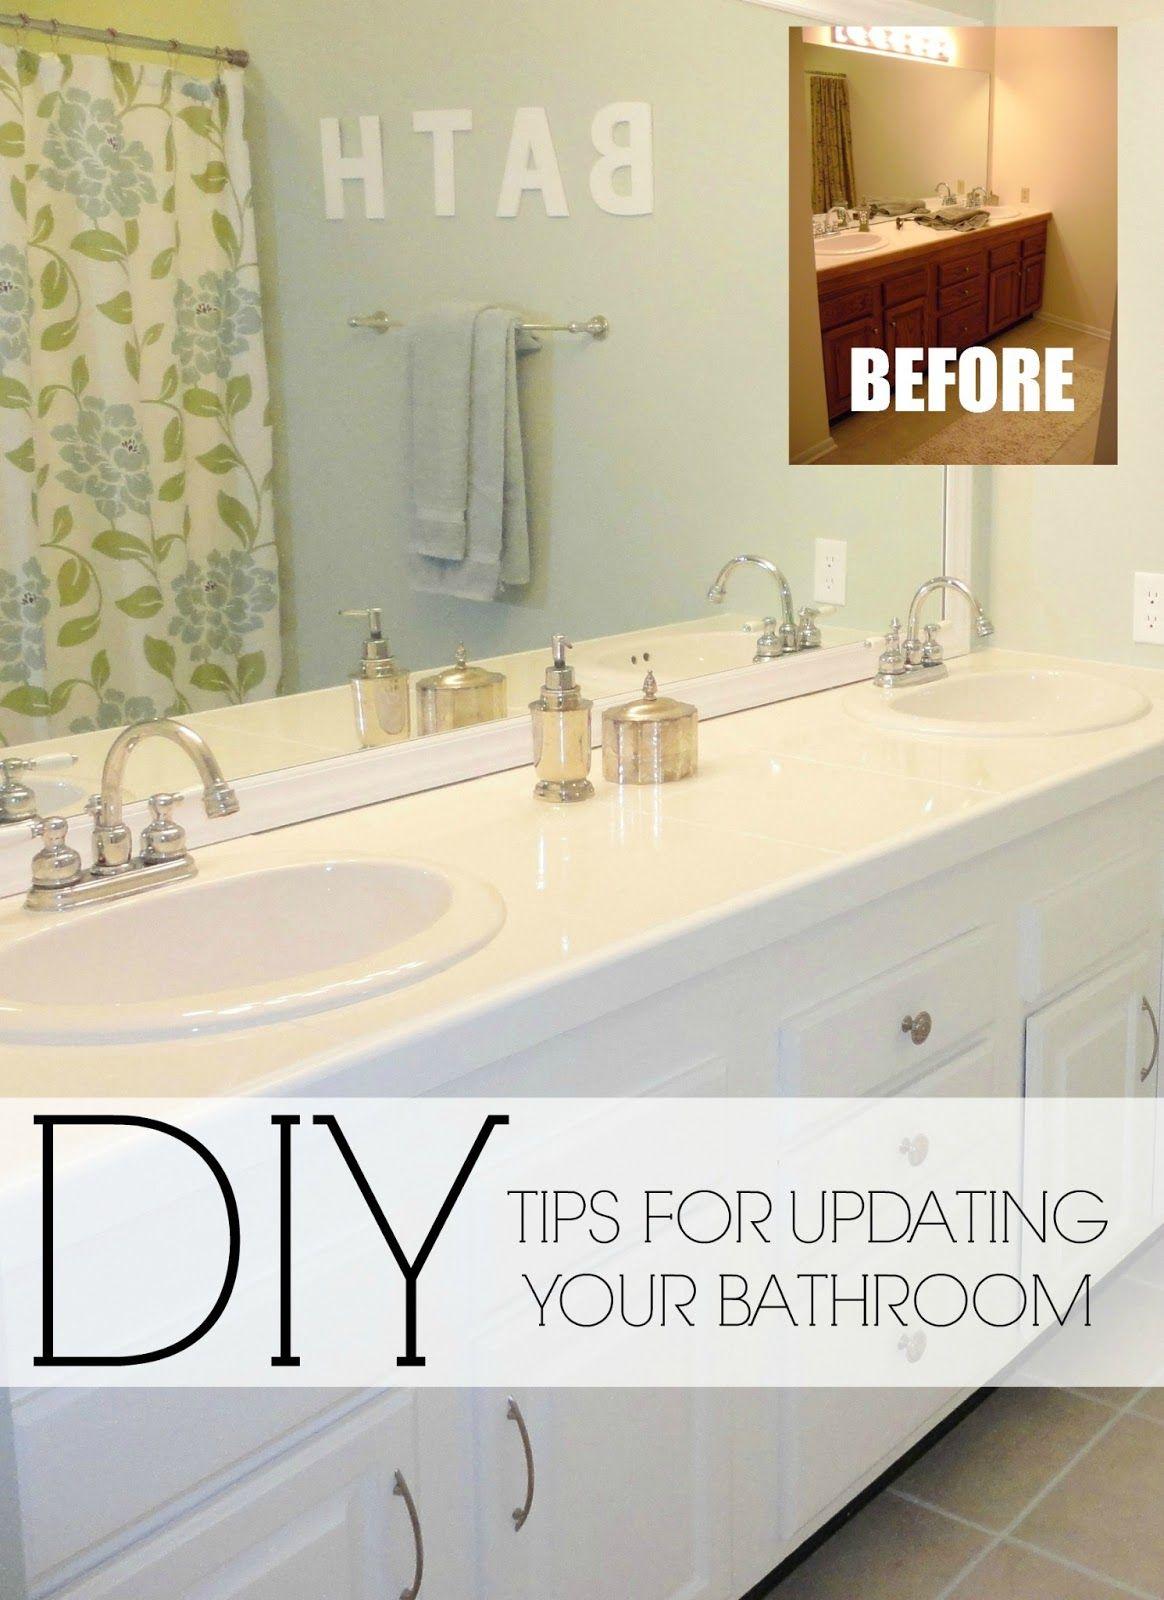 Easy Bathroom Decorating Ideas latest posts under: bathroom decorating ideas | bathroom design